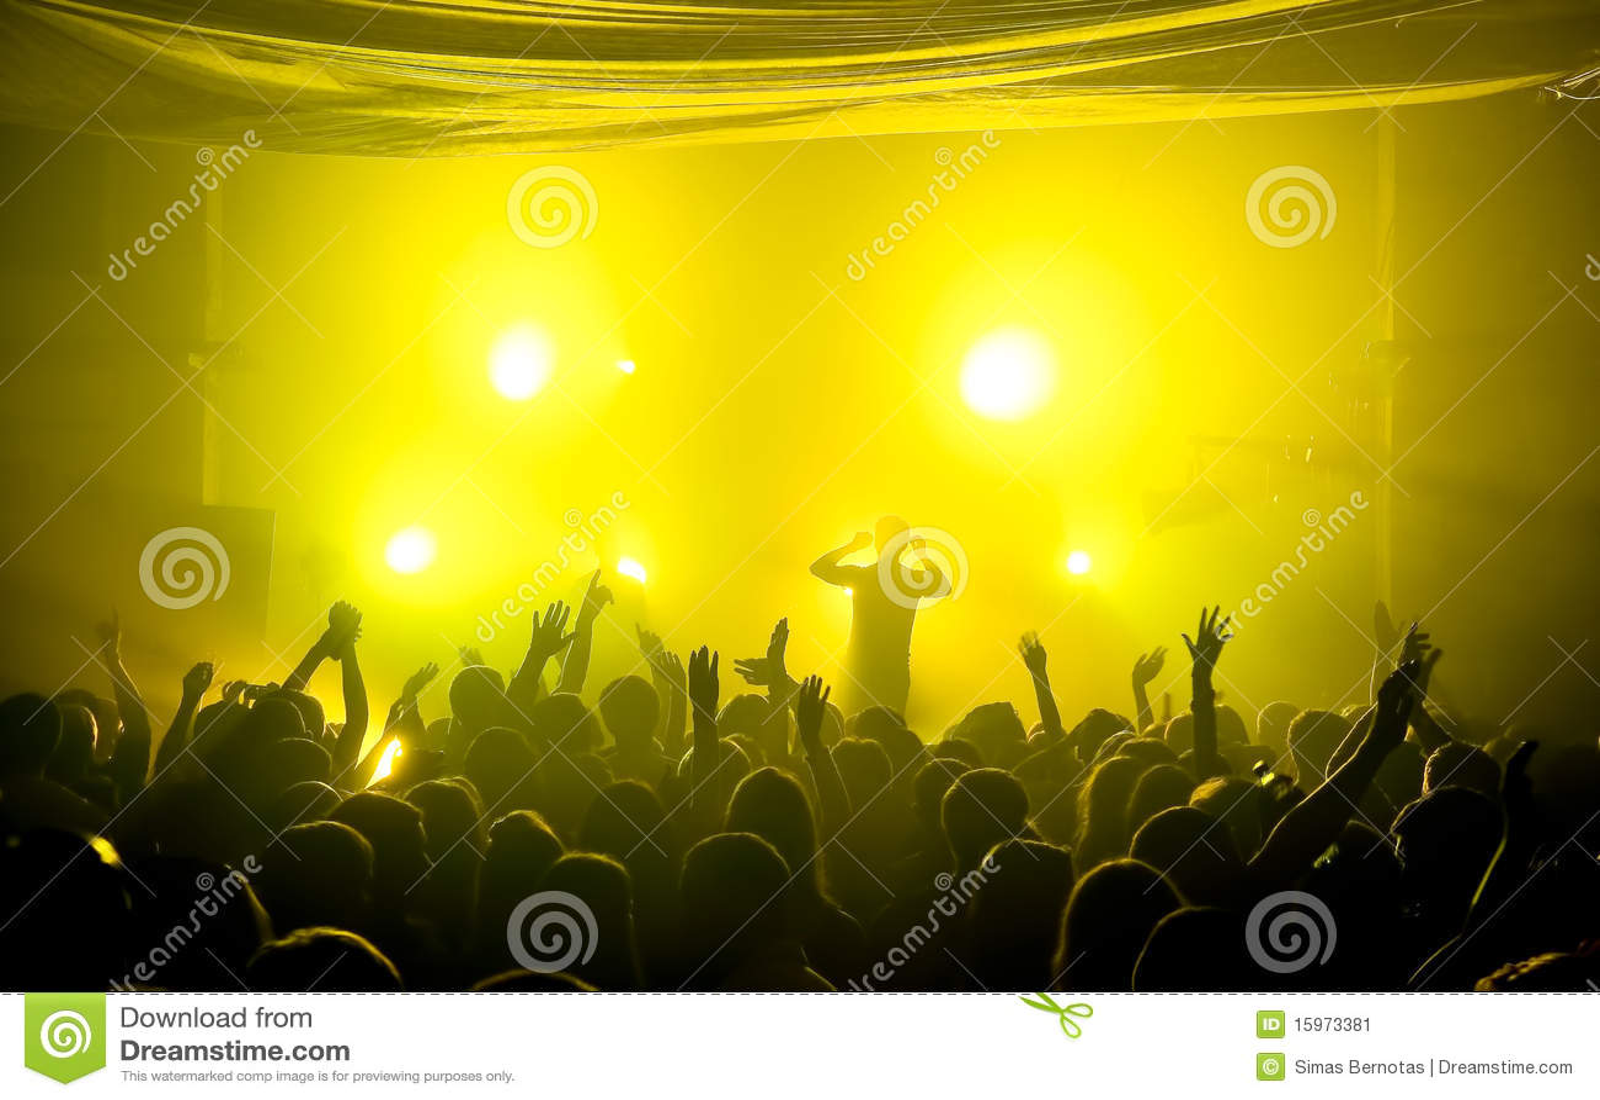 Concerto subterrâneo da música do clube